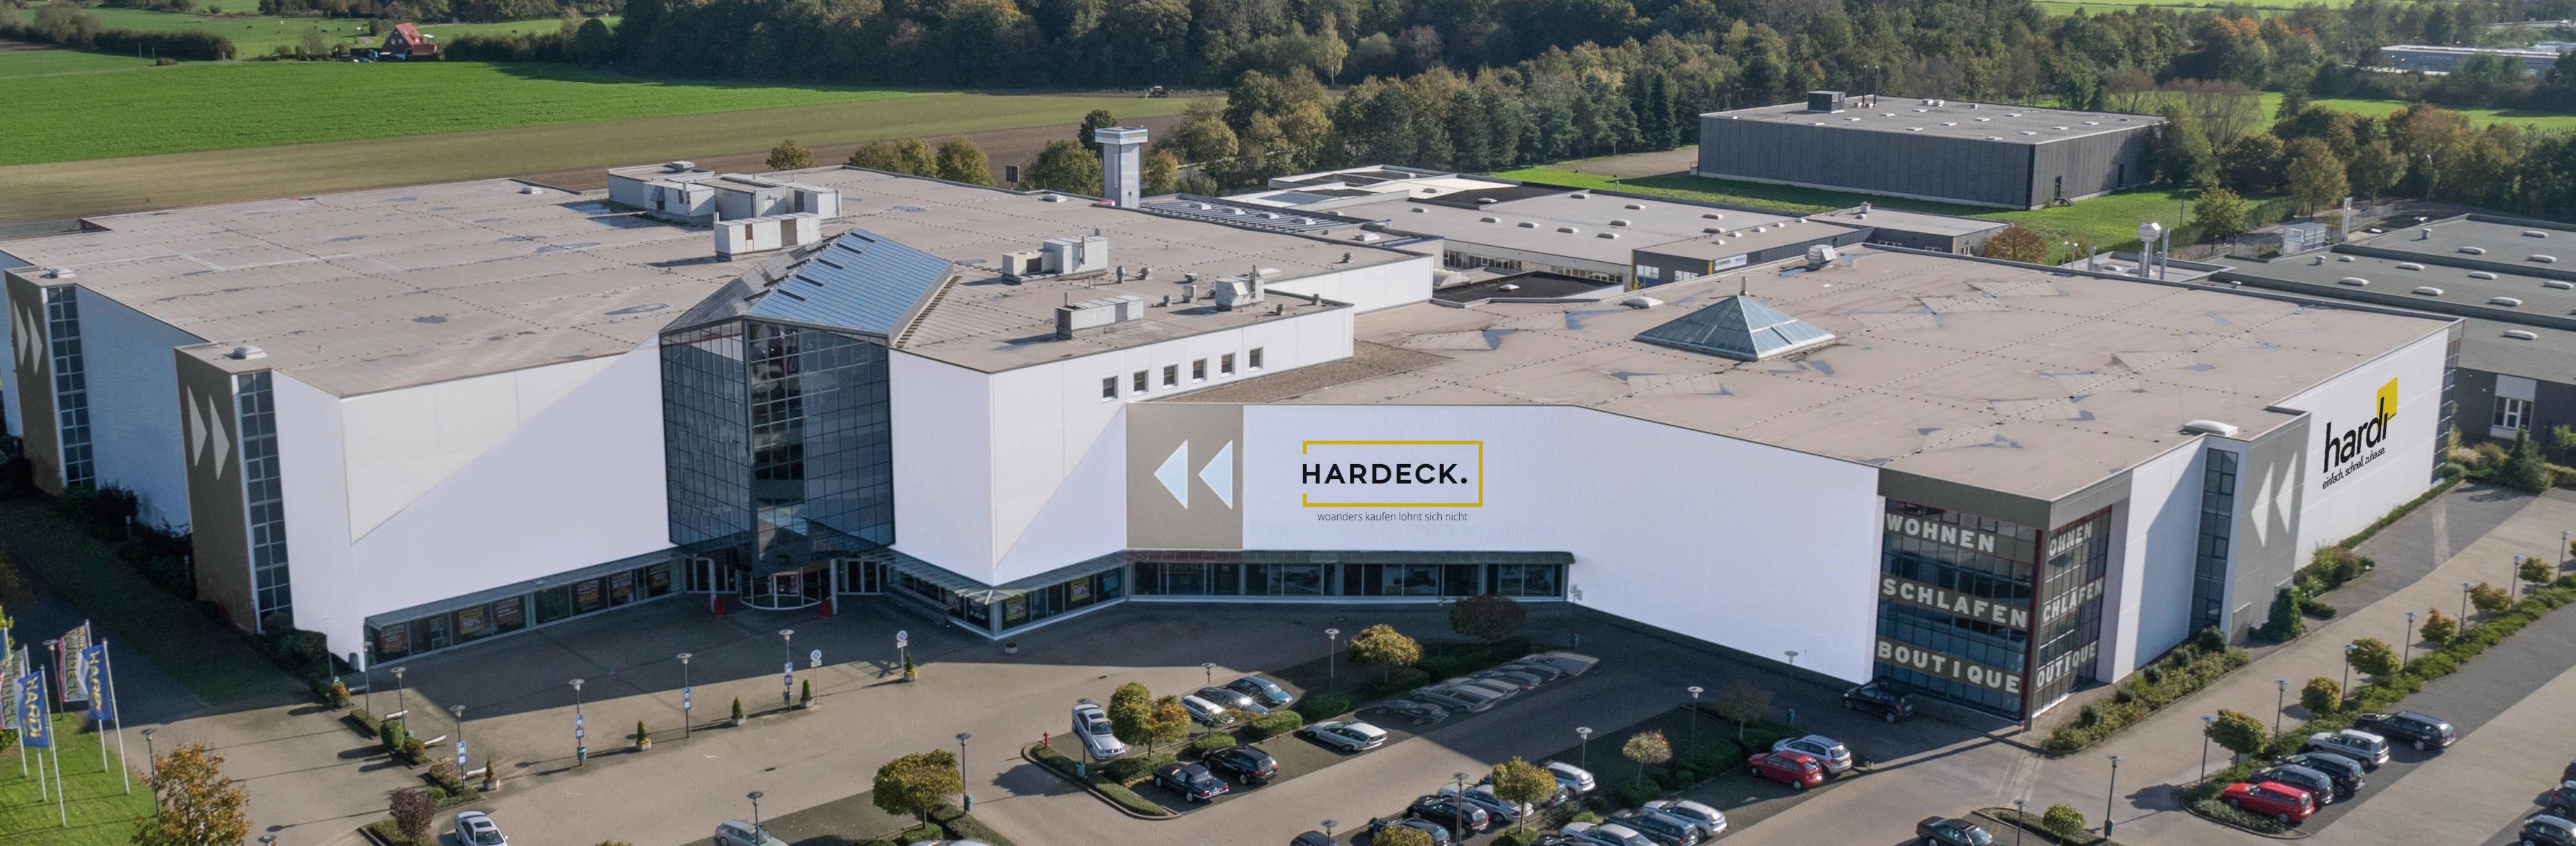 Hardeck Filiale Senden